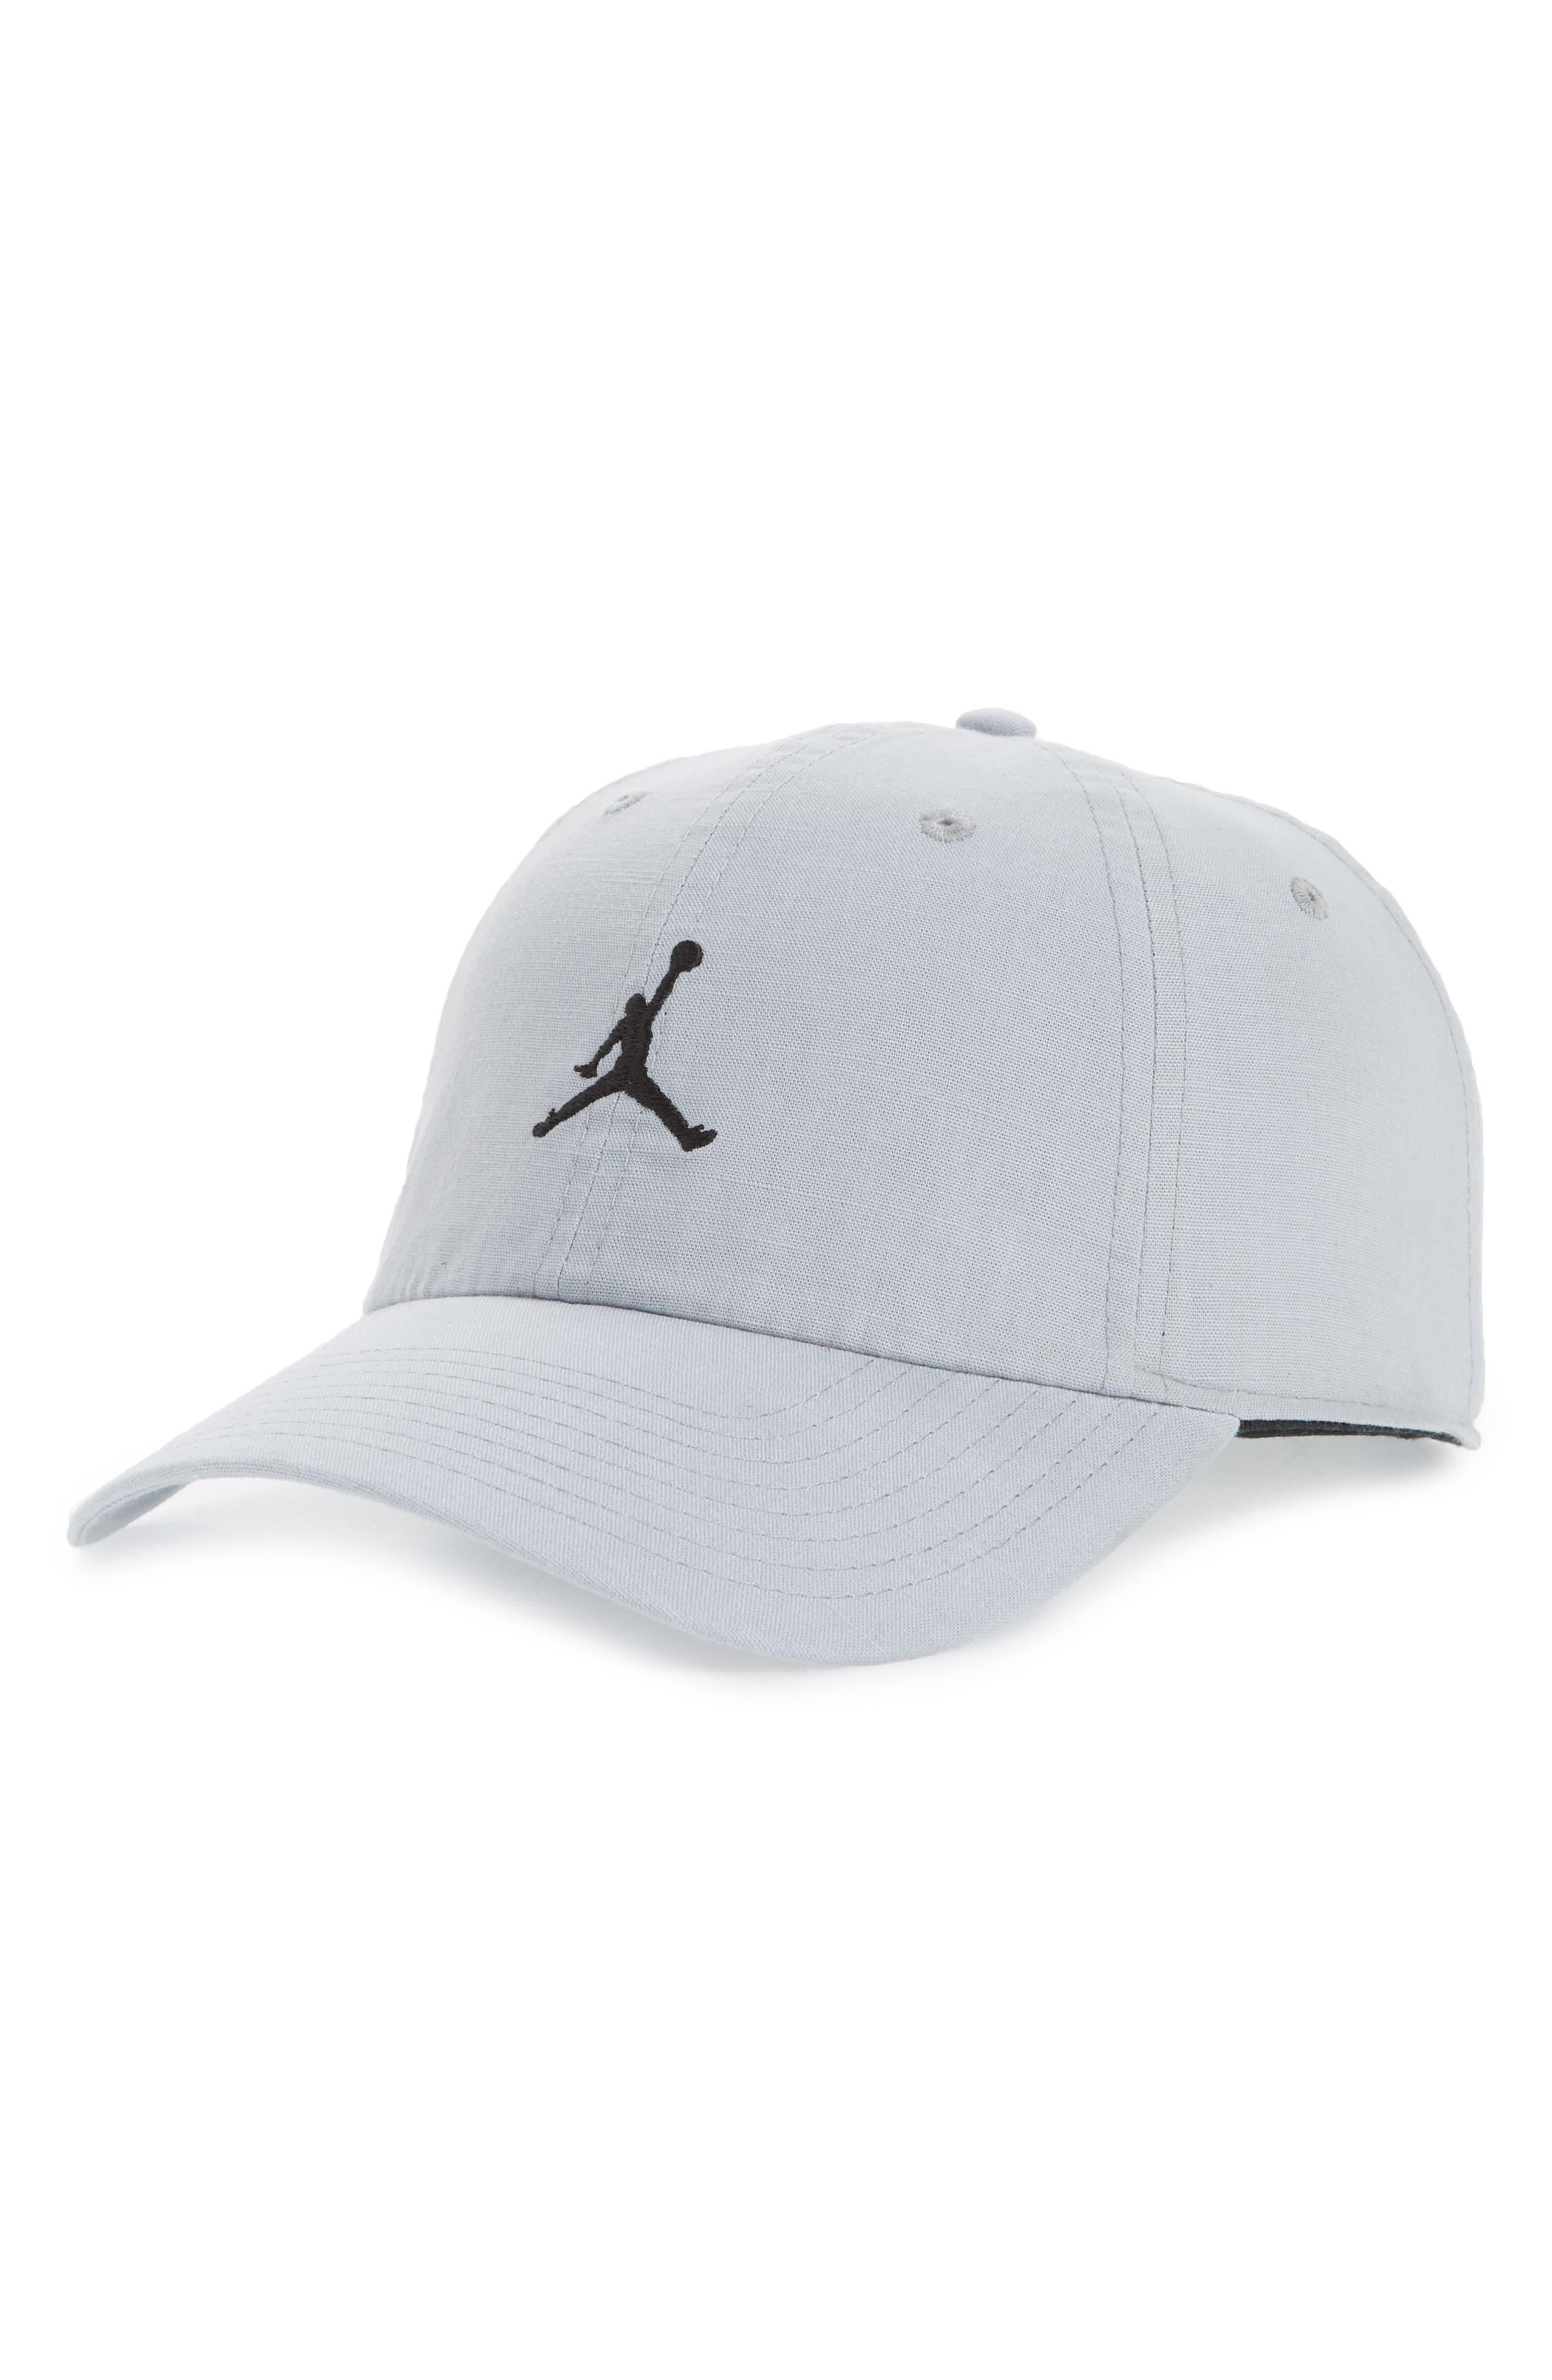 Jordan H86 Jumpman Washed Baseball Cap,                         Main,                         color, 012